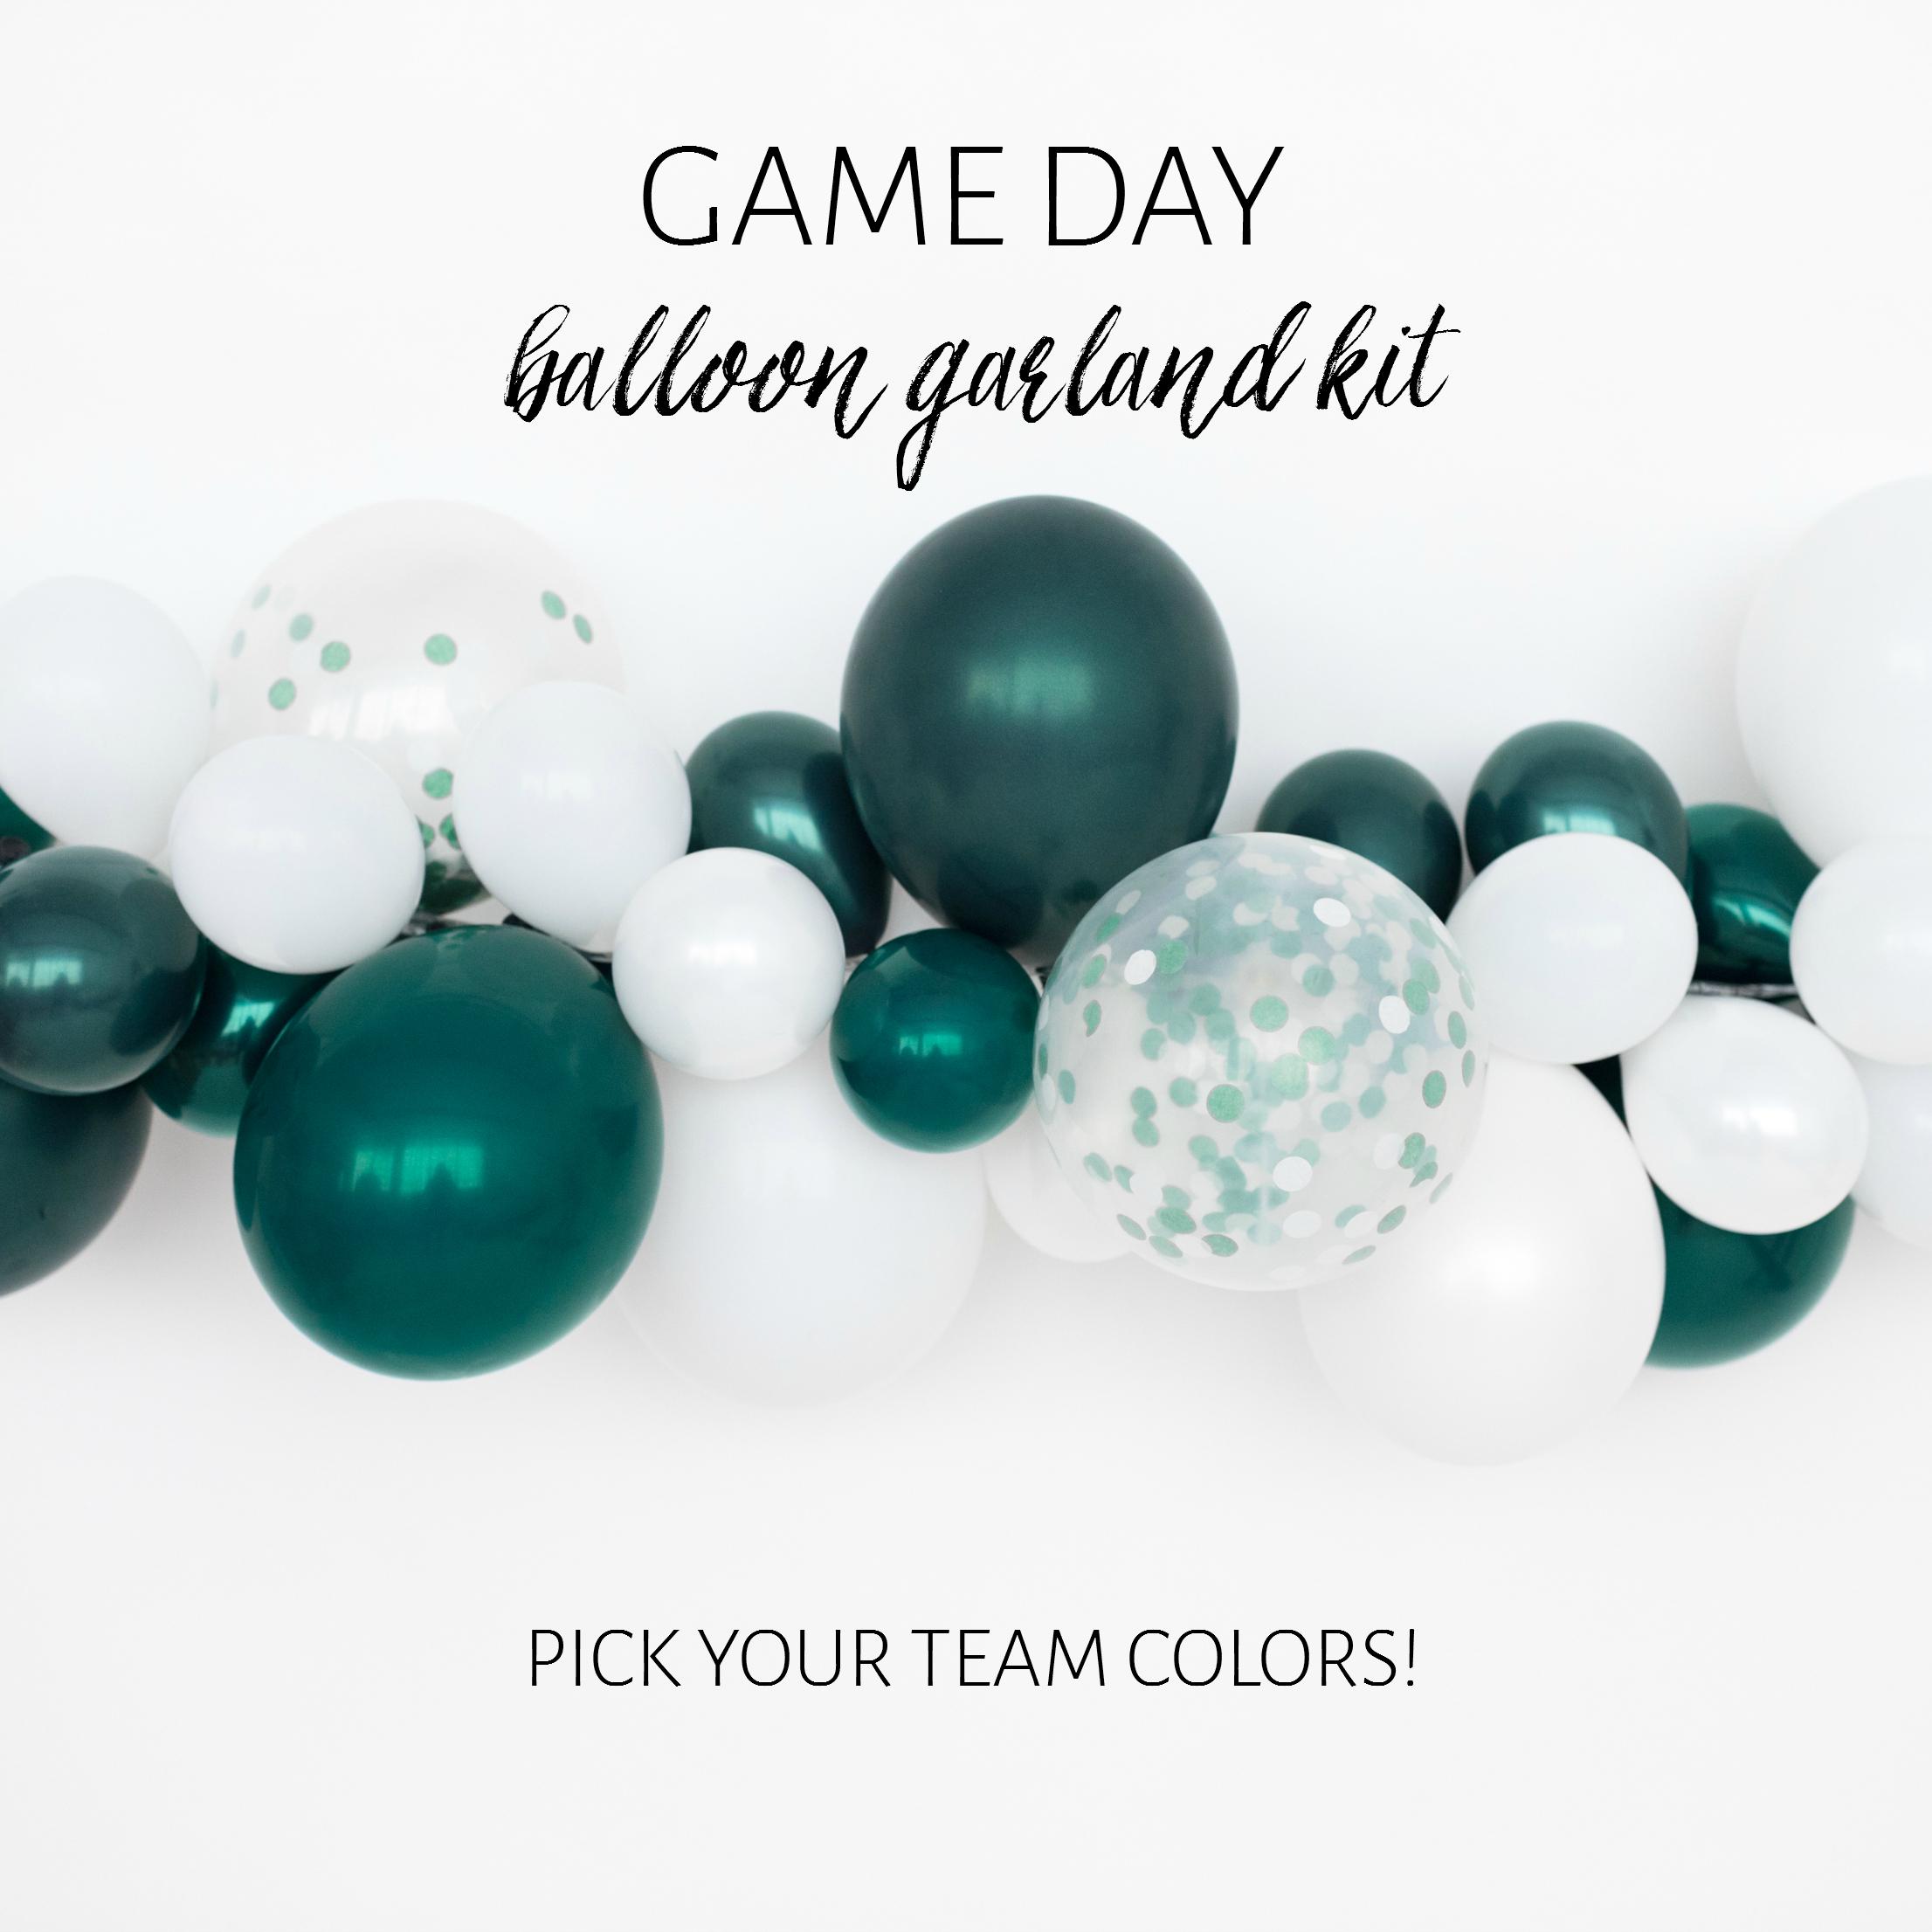 gameday-balloon-garland